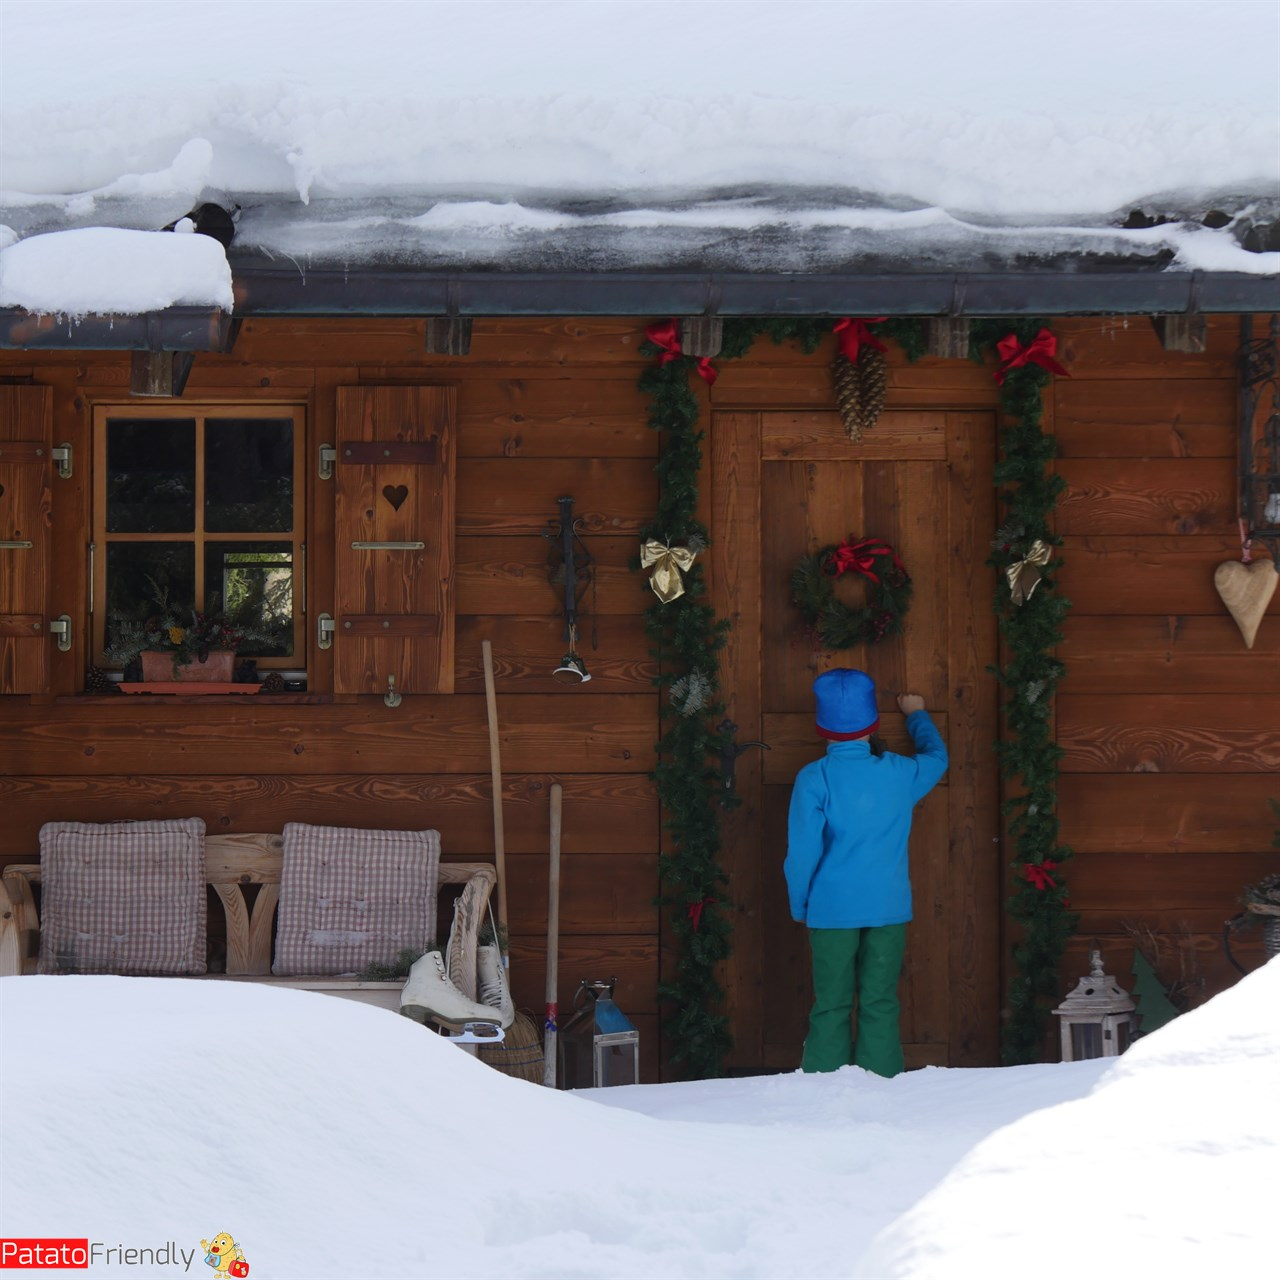 [cml_media_alt id='13451']Una vacanza a La Tzoumaz in mezzo alla neve[/cml_media_alt]